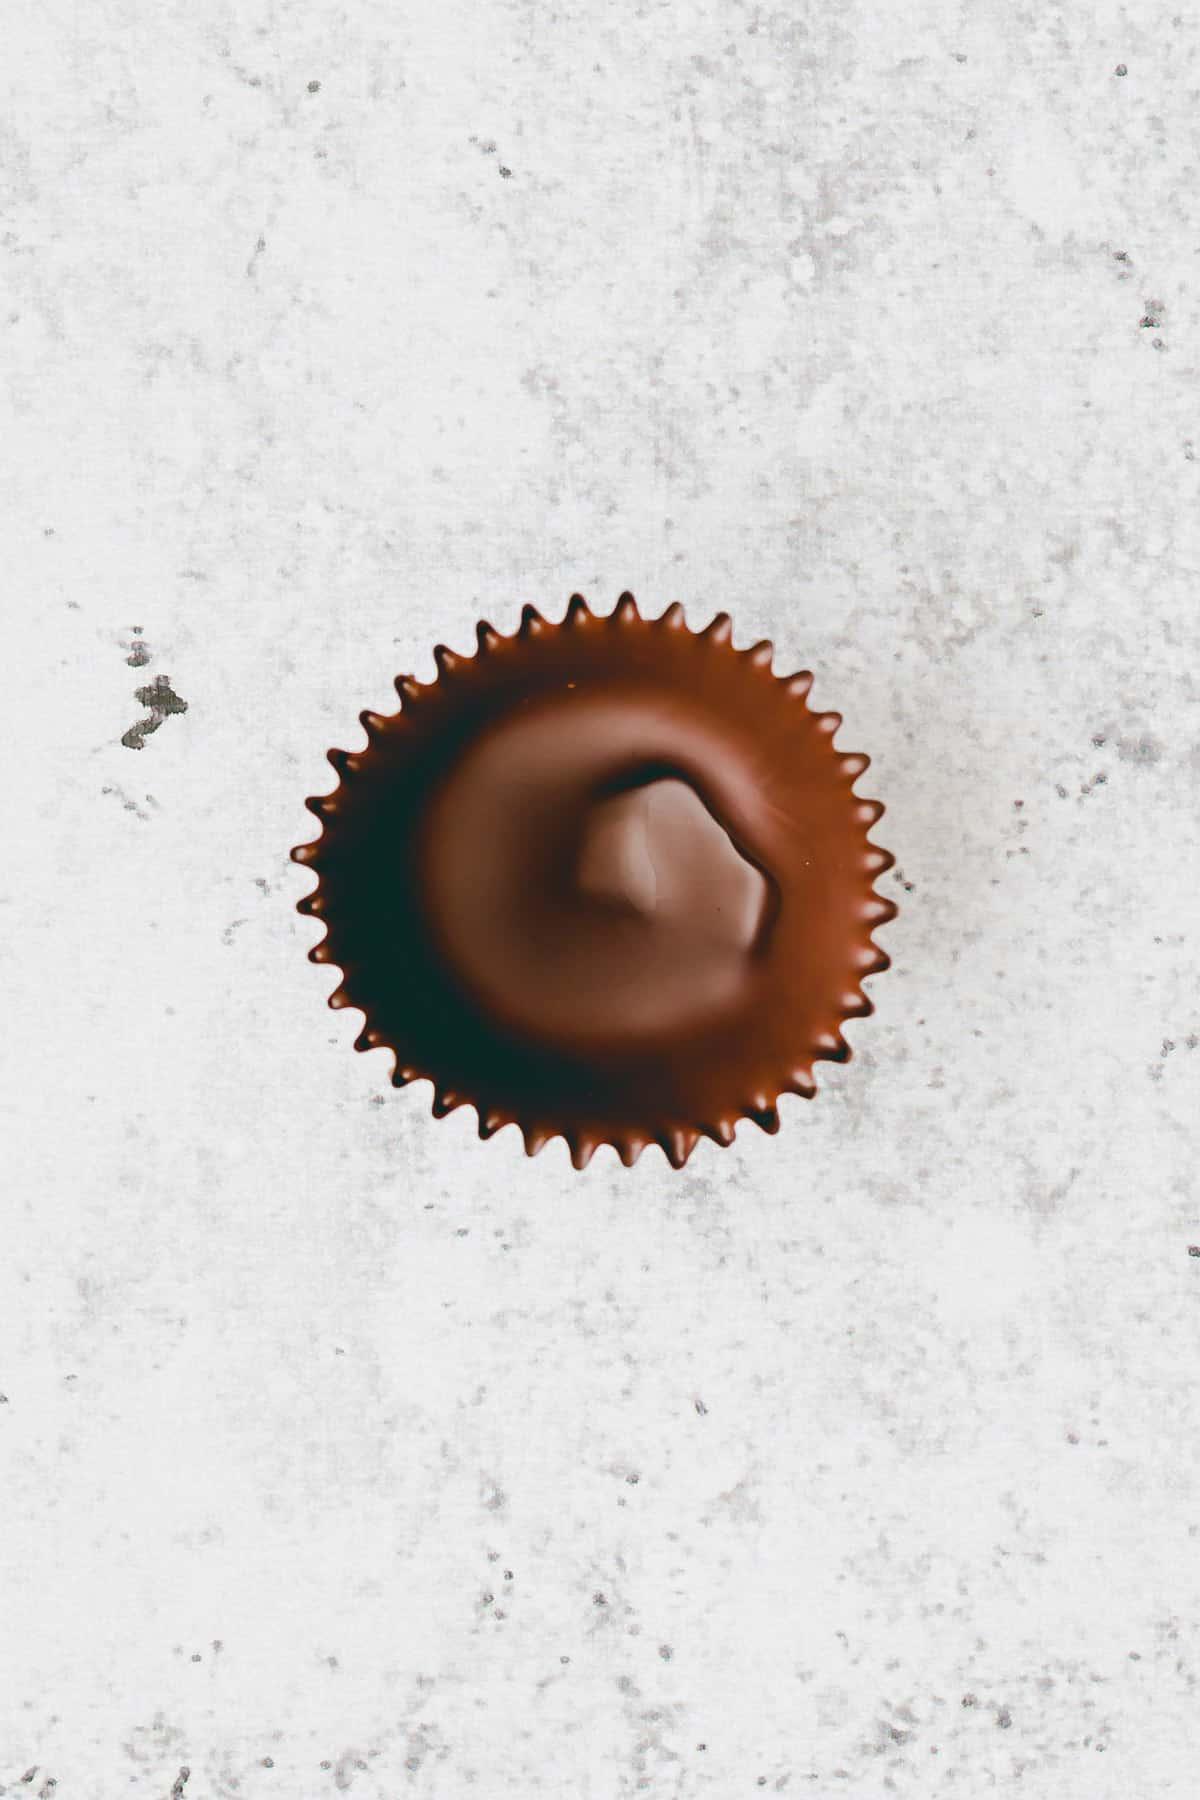 Salted Caramel Chocolate Cups Recipe Step 3